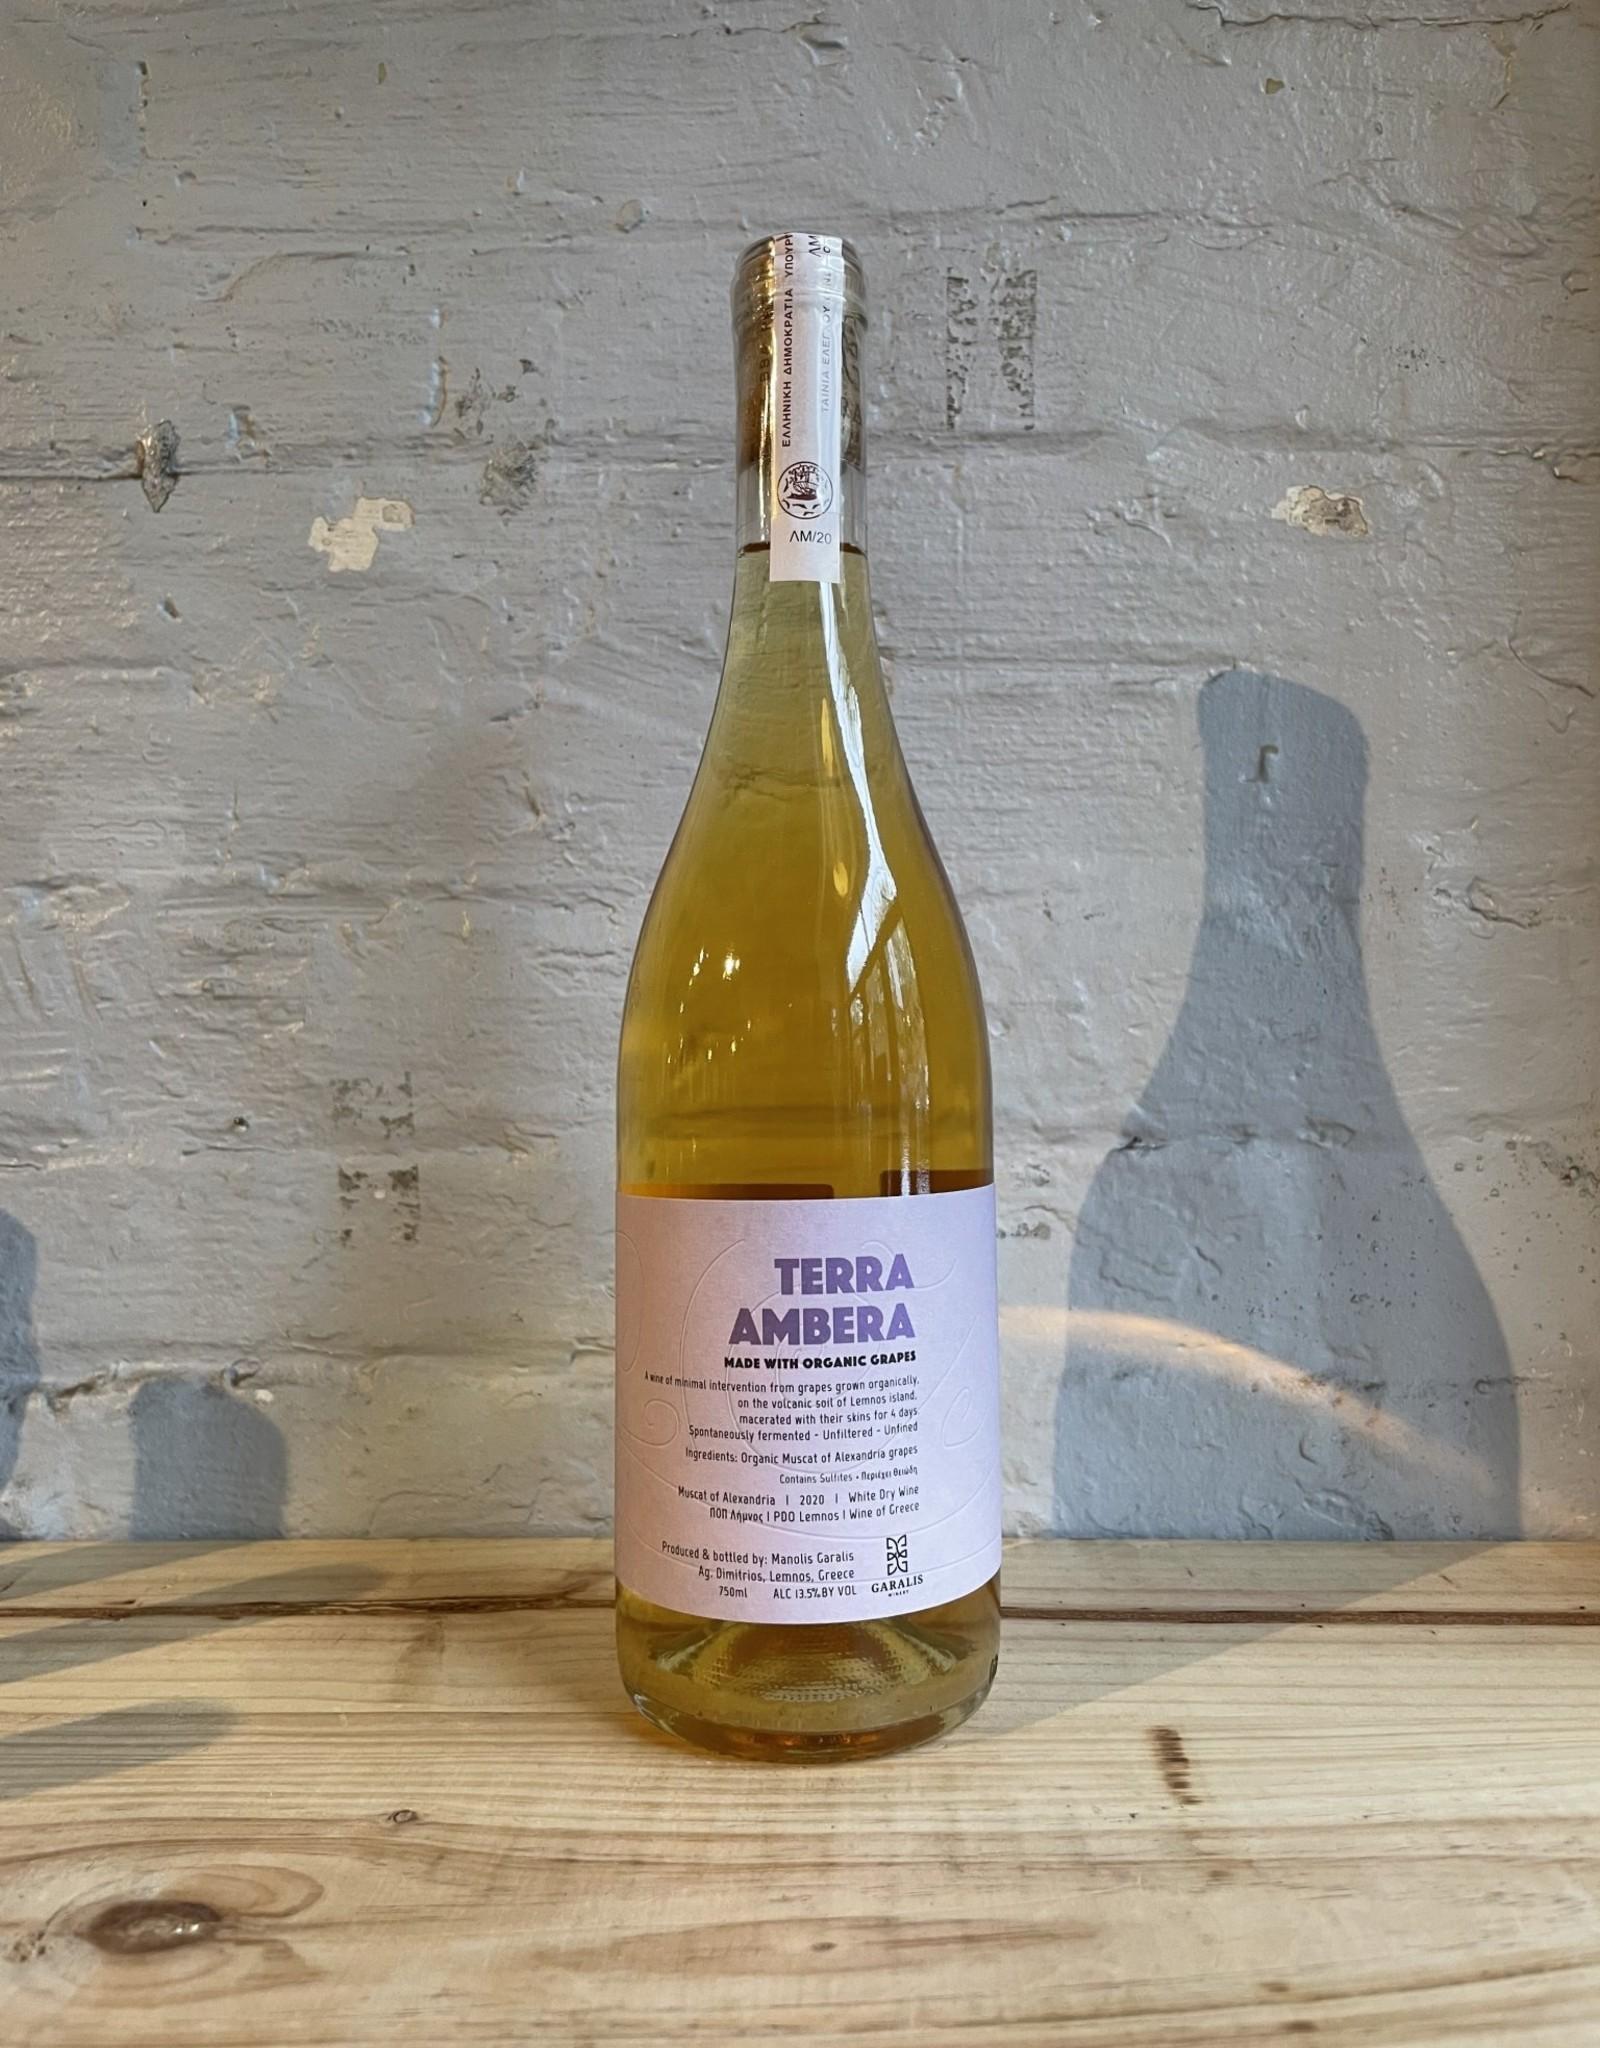 Wine 2020 Garalis Terra Ambera Muscat d'Alexandria - Lemnos, Greece (750ml)